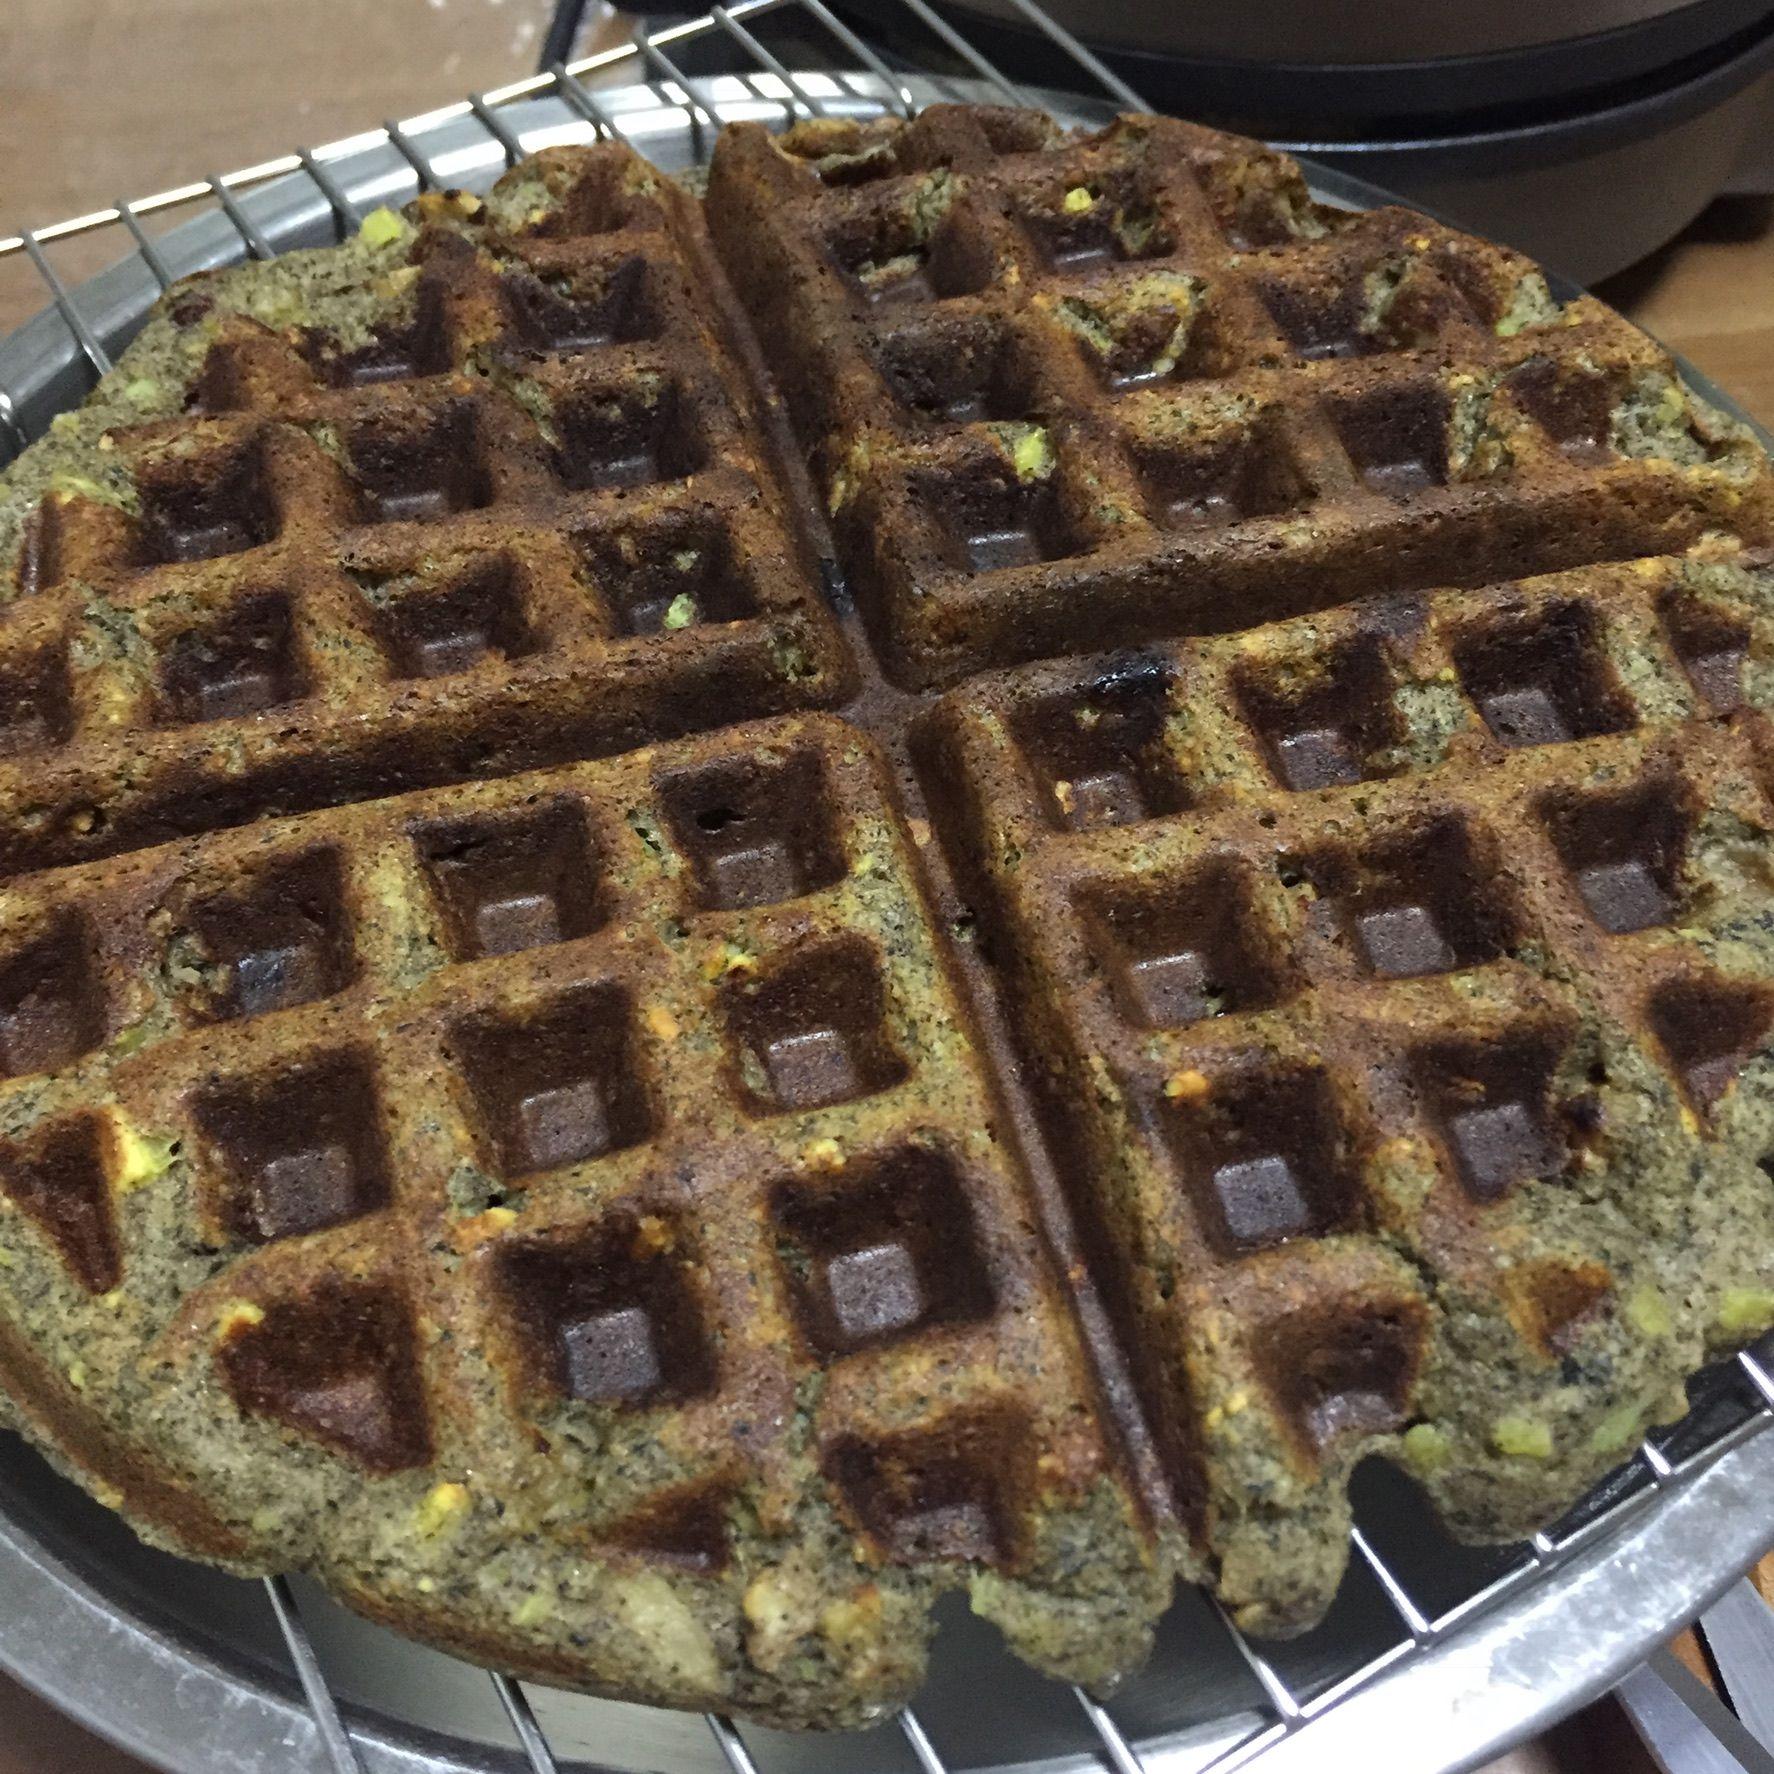 Mashed Sweet Potato waffle - Mashed sweet potato 350g + buckwheat flour 40g + black sesame powder 20g + ground oats 30g + APF 40g + yogurt 200g + walnut 30g + chopped red dates 4 + dried raisins 40g + salt 1/4tsp + 1 egg